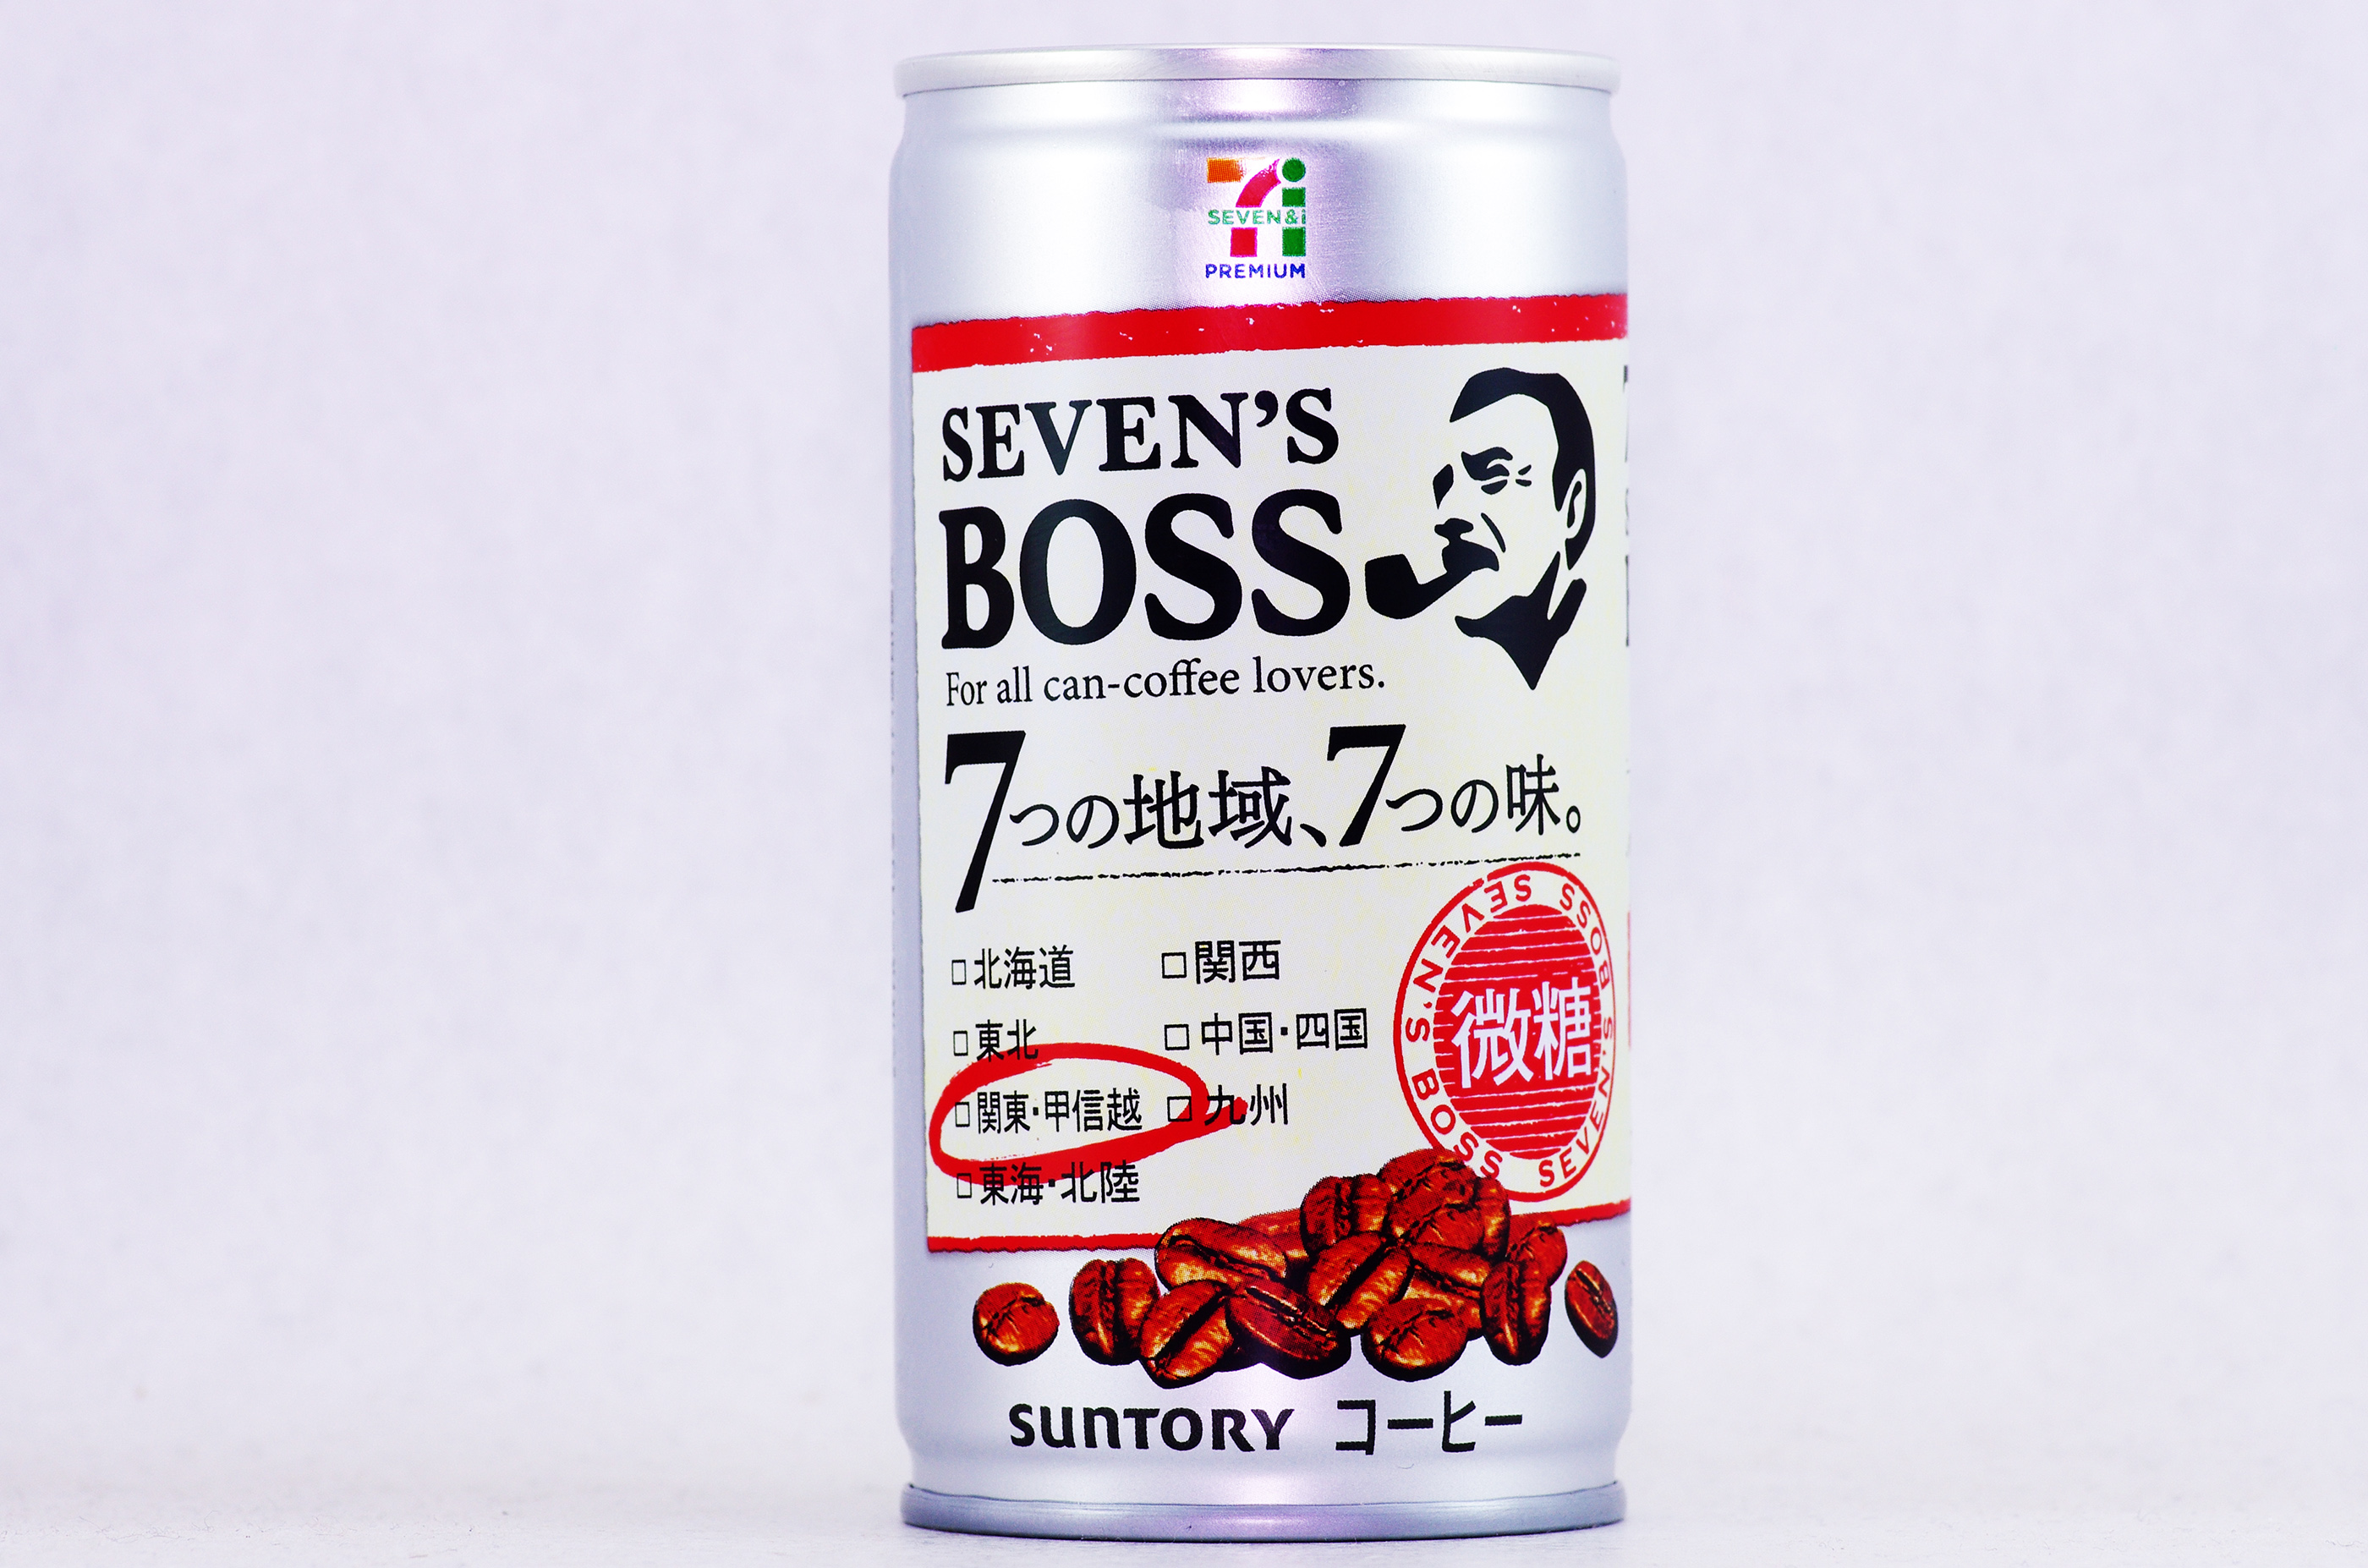 SEVEN'S BOSS 微糖 関東・甲信越限定 前回登録品